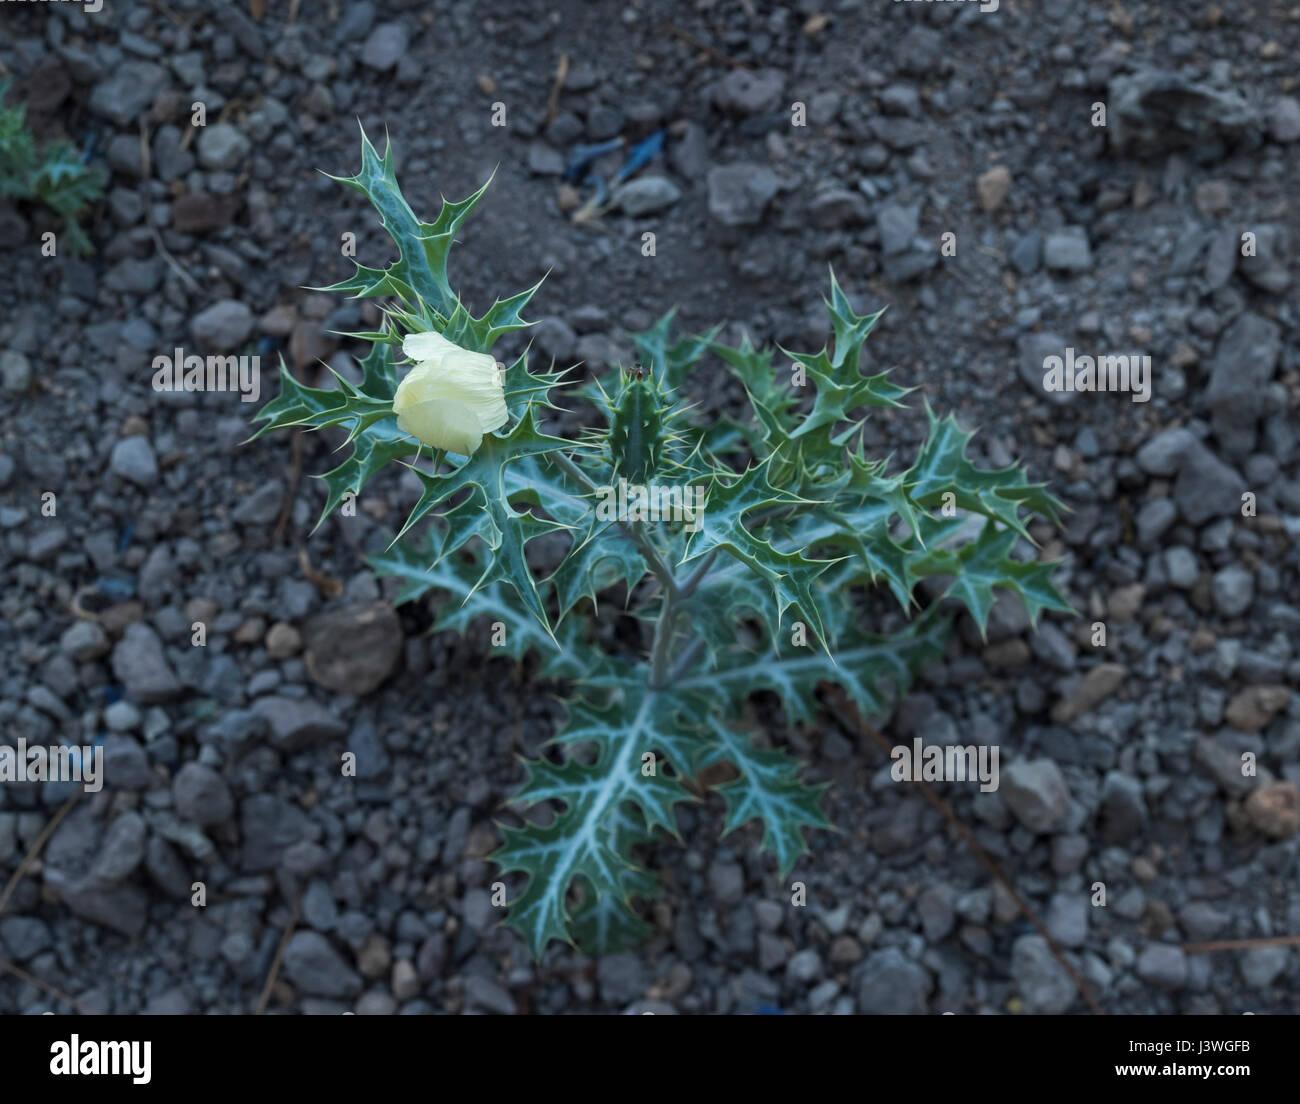 unknown-plant-awaiting-id-flowering-by-the-roadside-near-ifonche-tenerife-J3WGFB.jpg